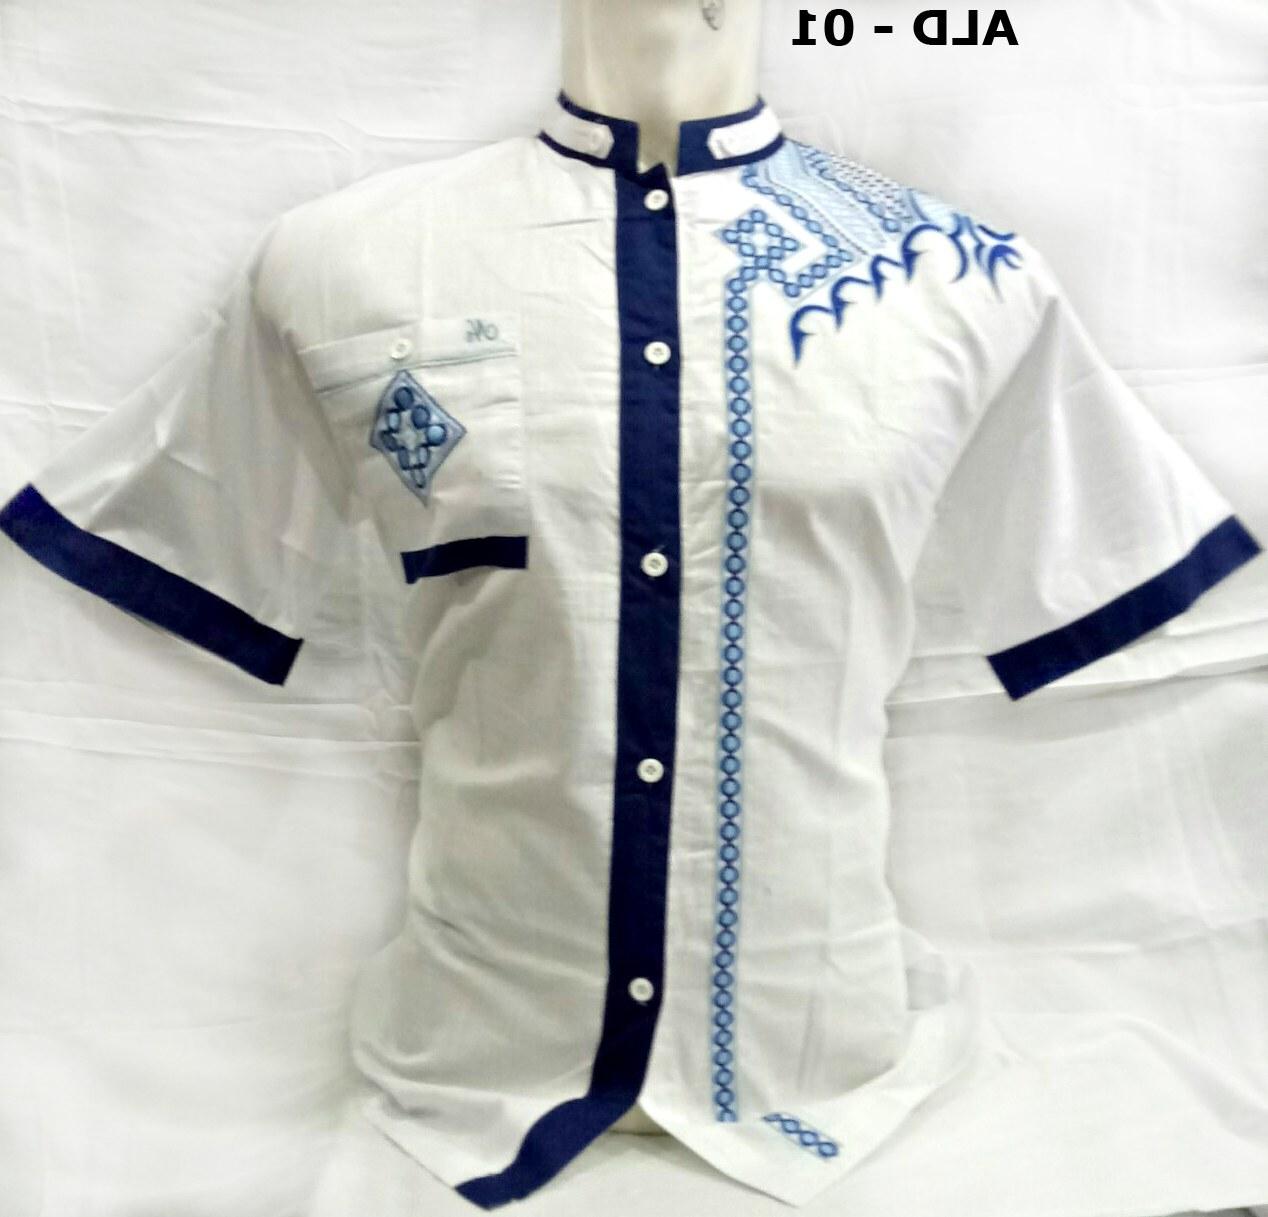 Model Harga Baju Lebaran 2018 Nkde Model Baju Koko Lebaran 2018 Terbaru Dan Harganya Murah